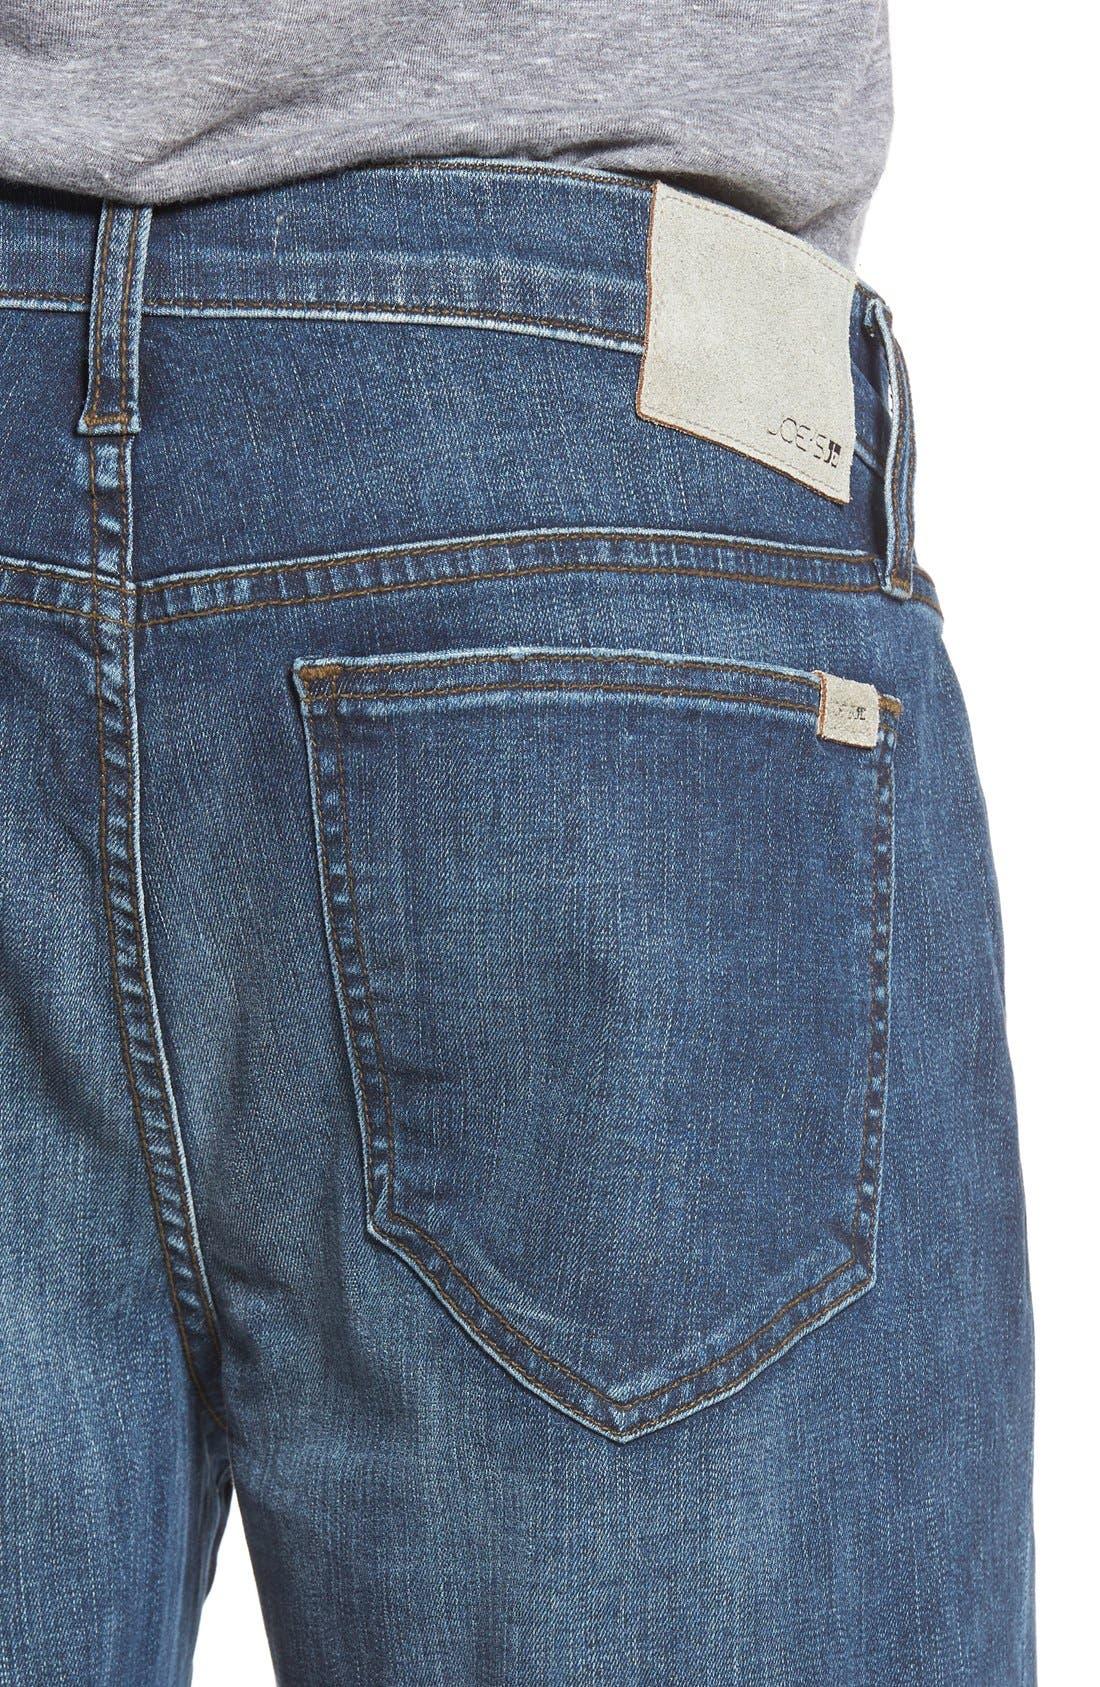 Alternate Image 4  - Joe's Brixton Slim Fit Jeans (Gladwin)